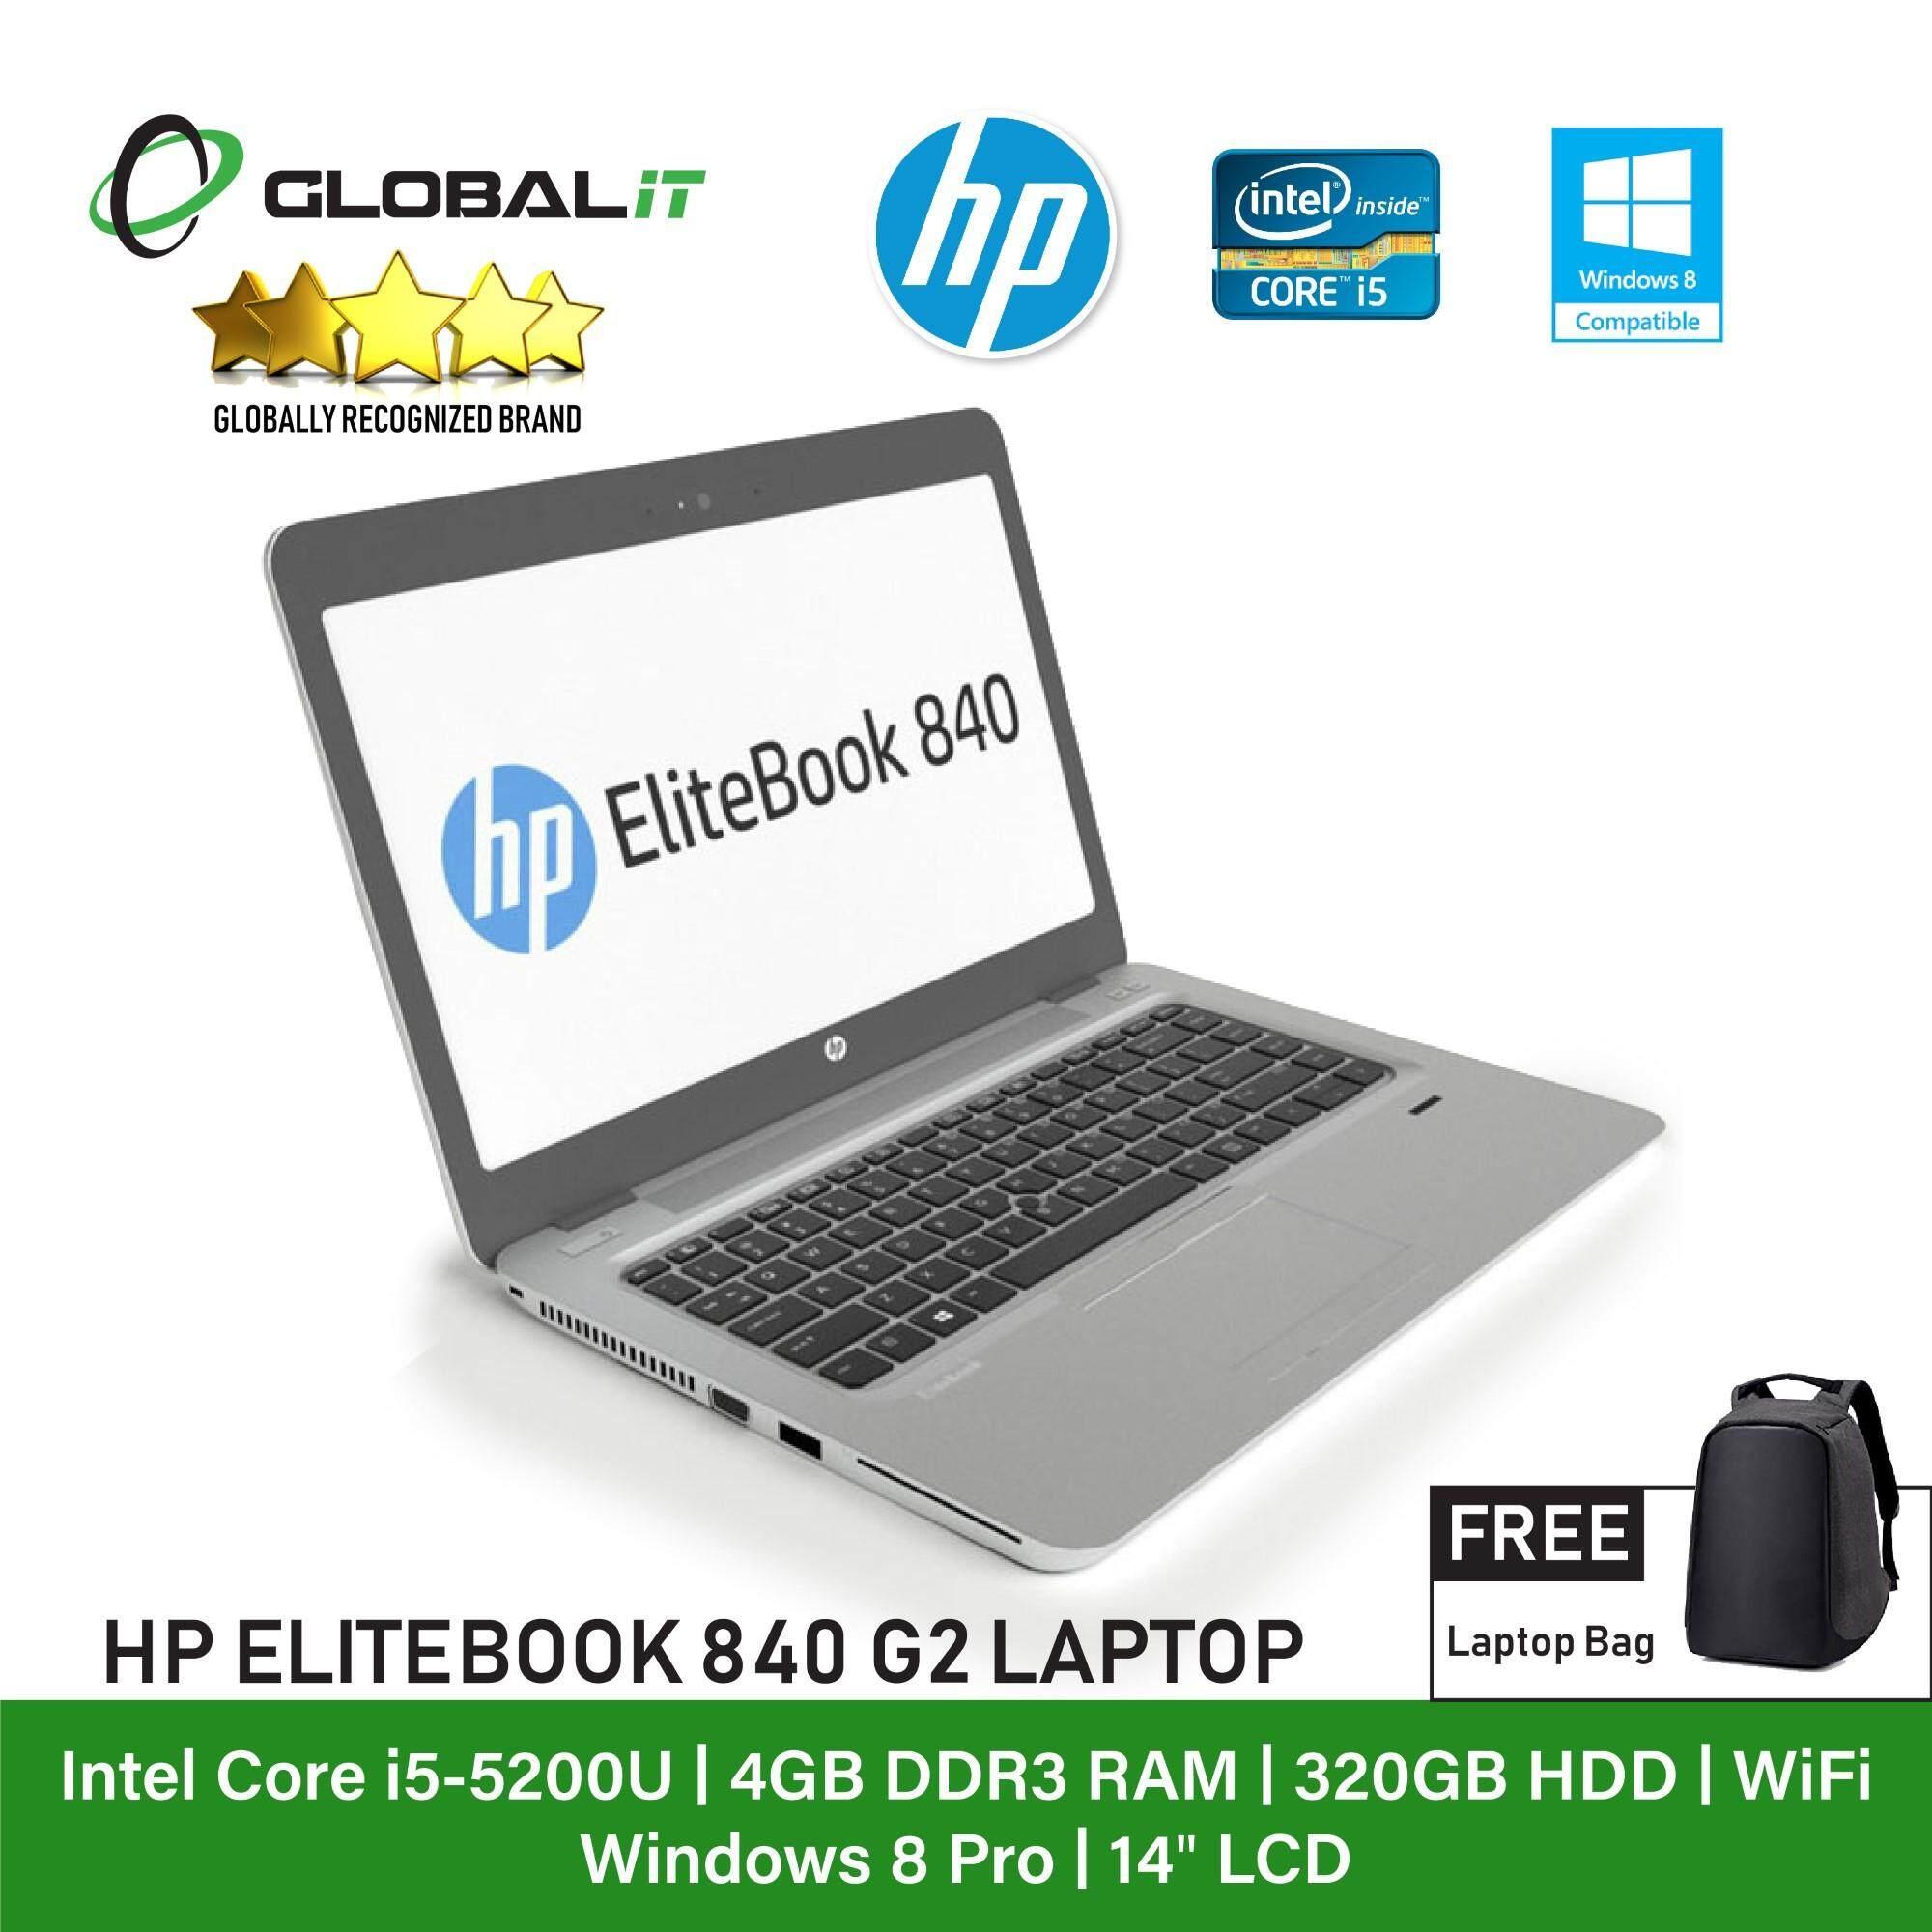 (Refurbished Notebook) HP Elitebook 840 G2 Laptop / 14 inch LCD / Intel Core i5-5200U / 4GB Ram / 320GB HDD / WiFi / Windows 8 Pro